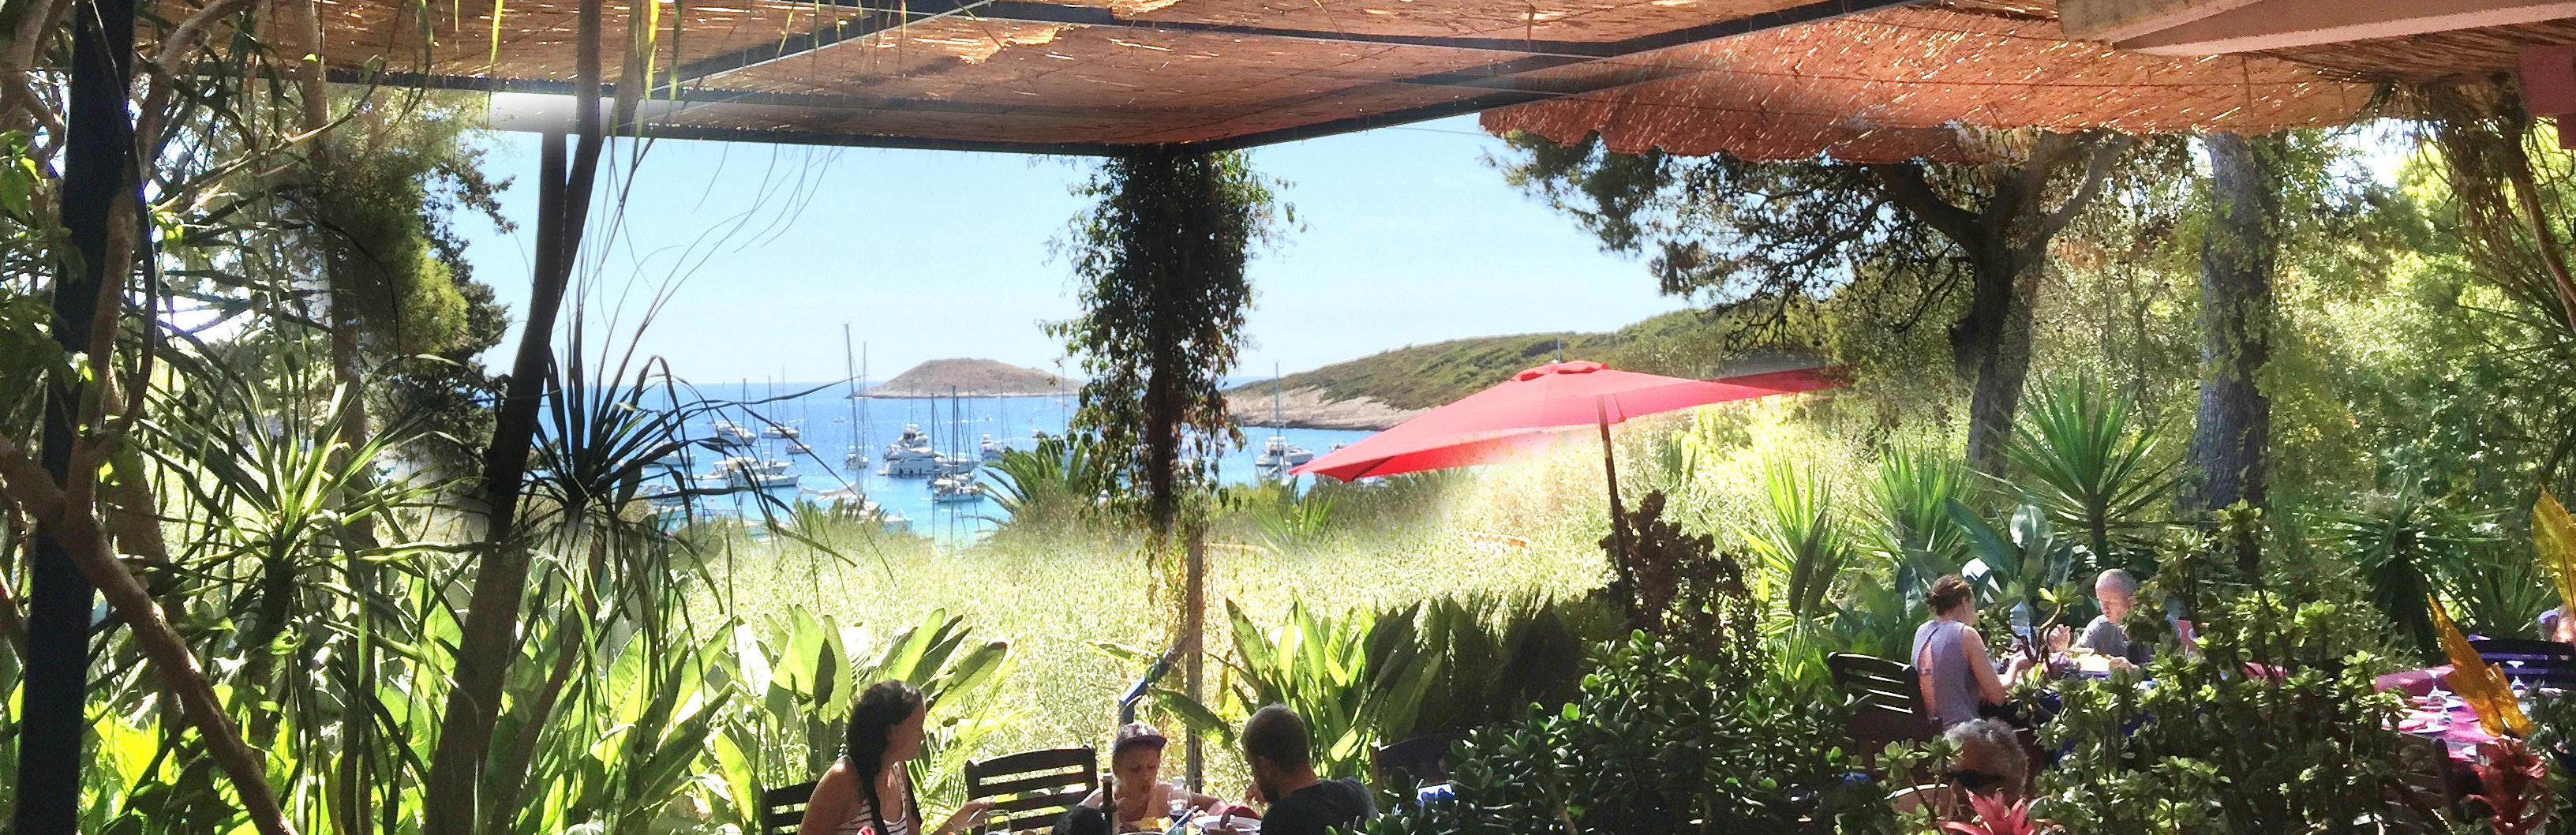 Foto De Stock Gratuita Sobre Restaurante Terraza Verano